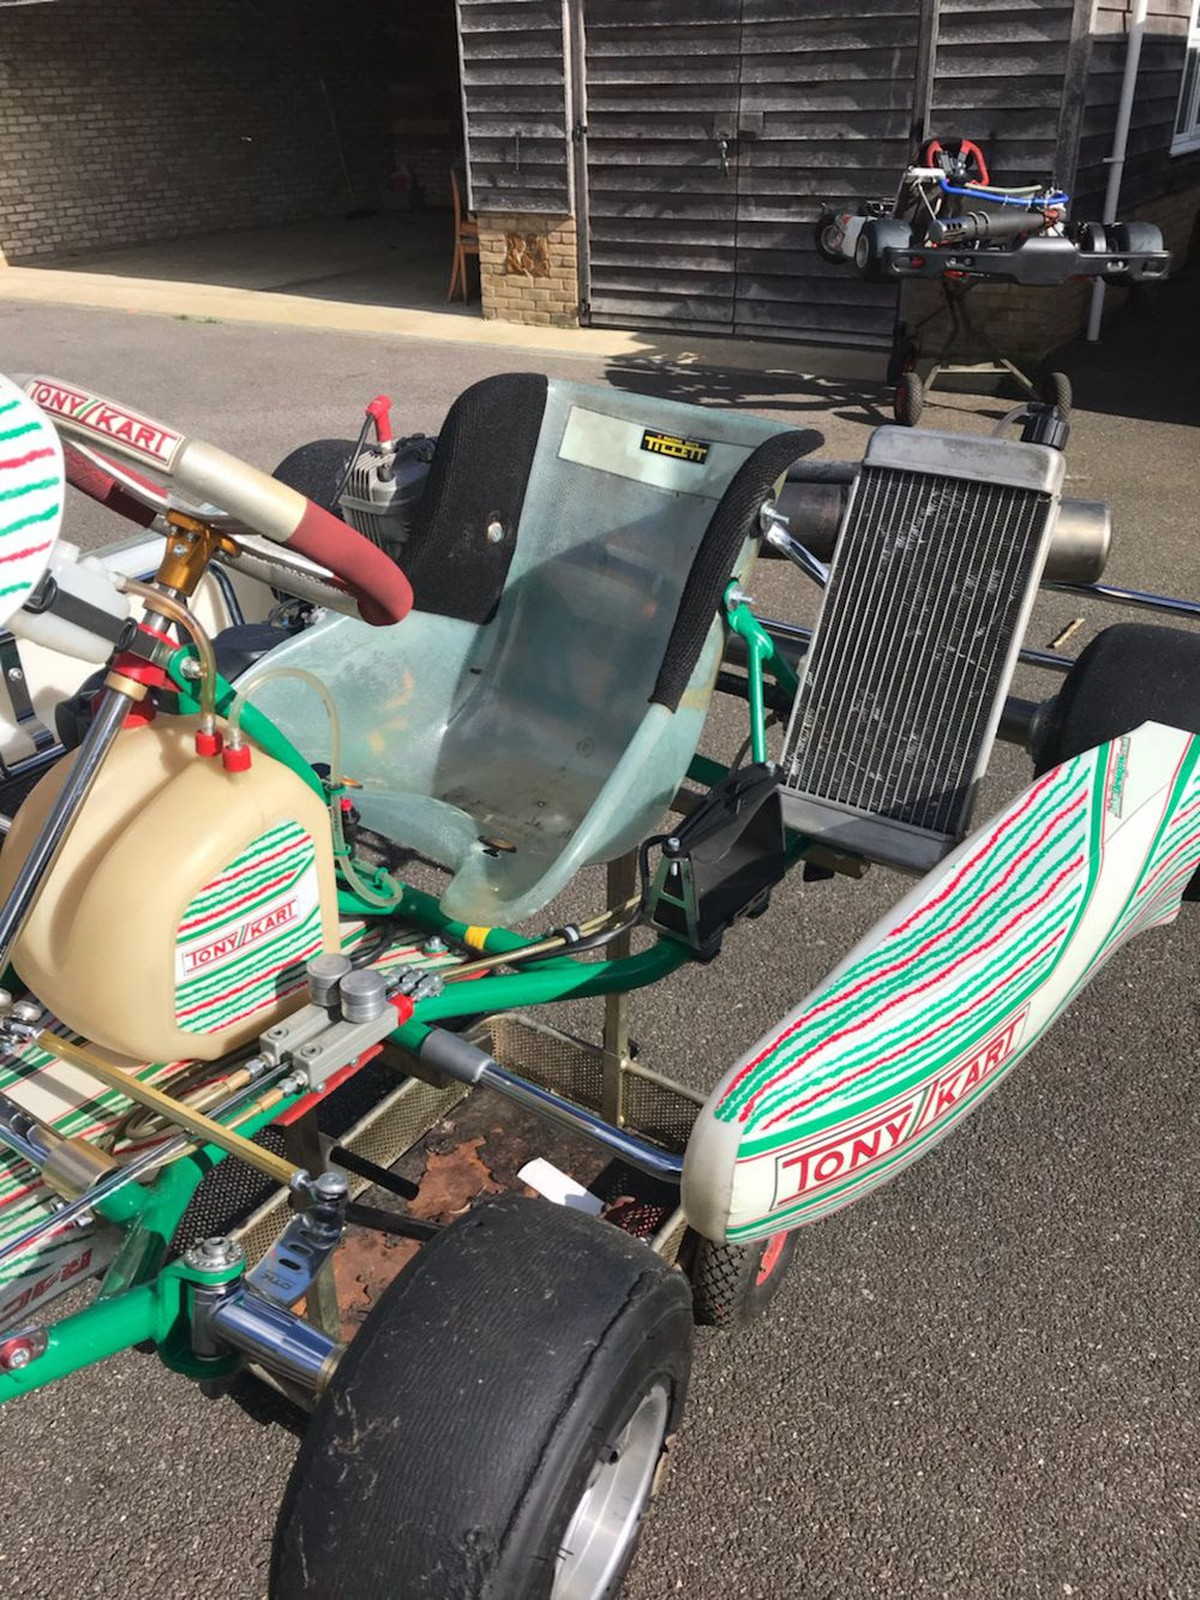 Secondhand Karting Co Uk Single Karts Tony Kart 401